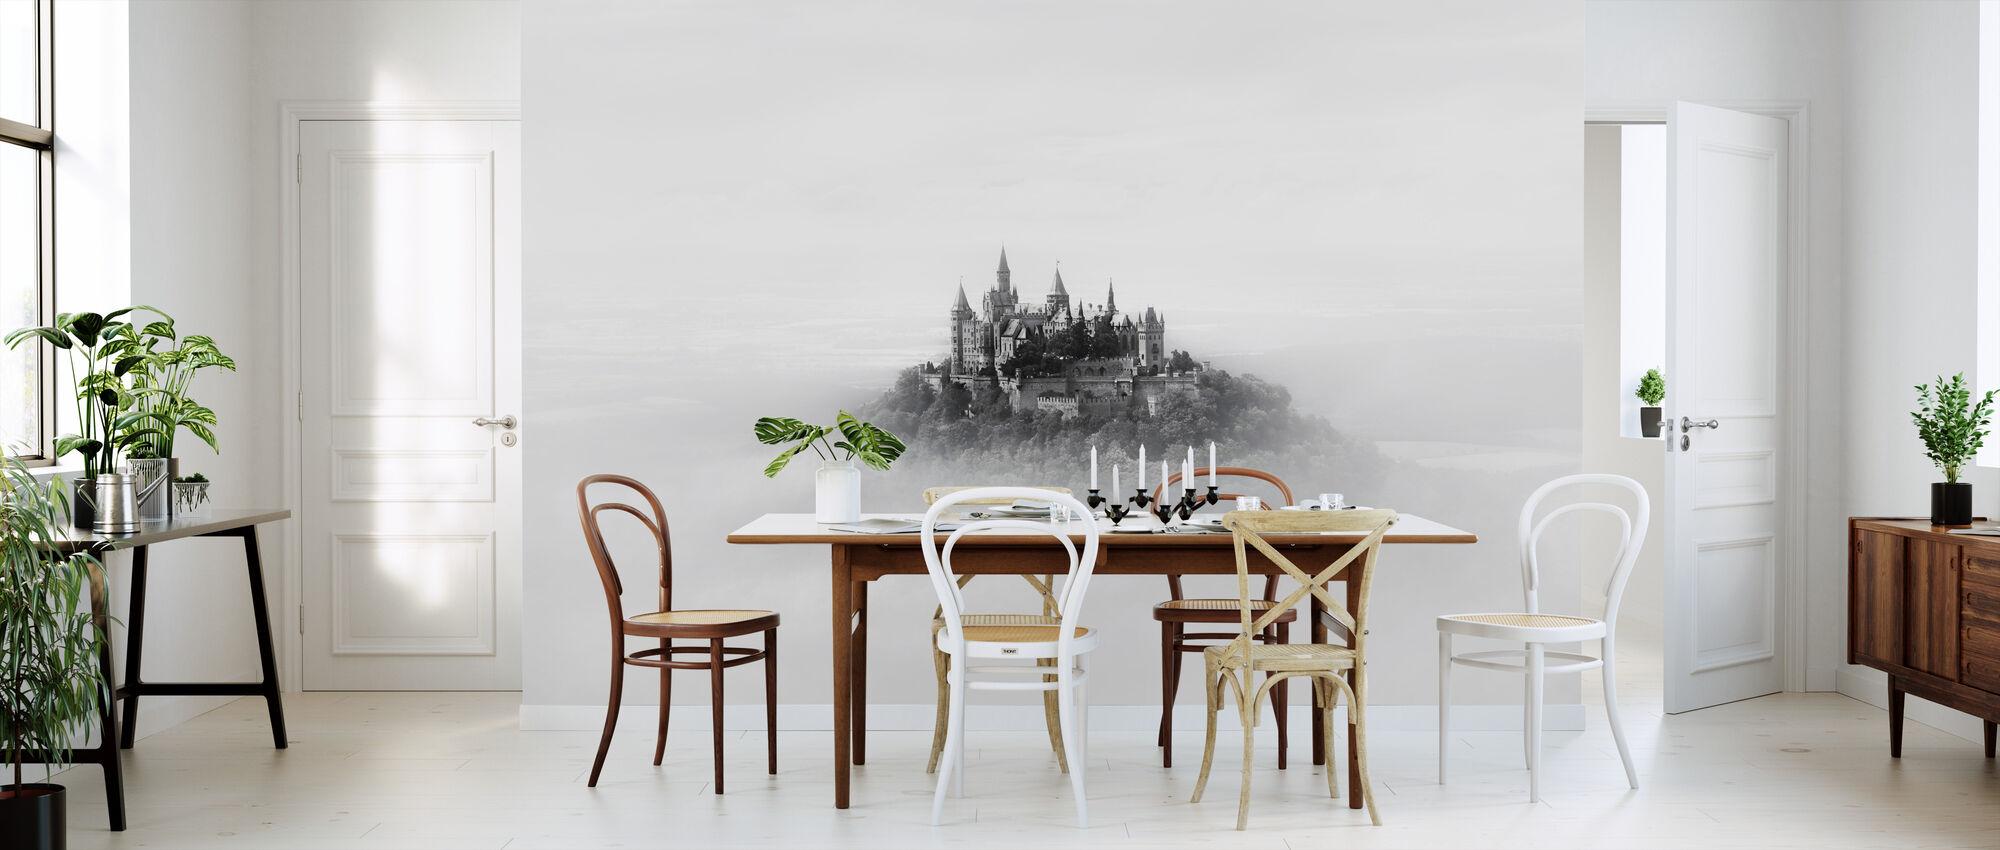 Hohenzollern - Wallpaper - Kitchen